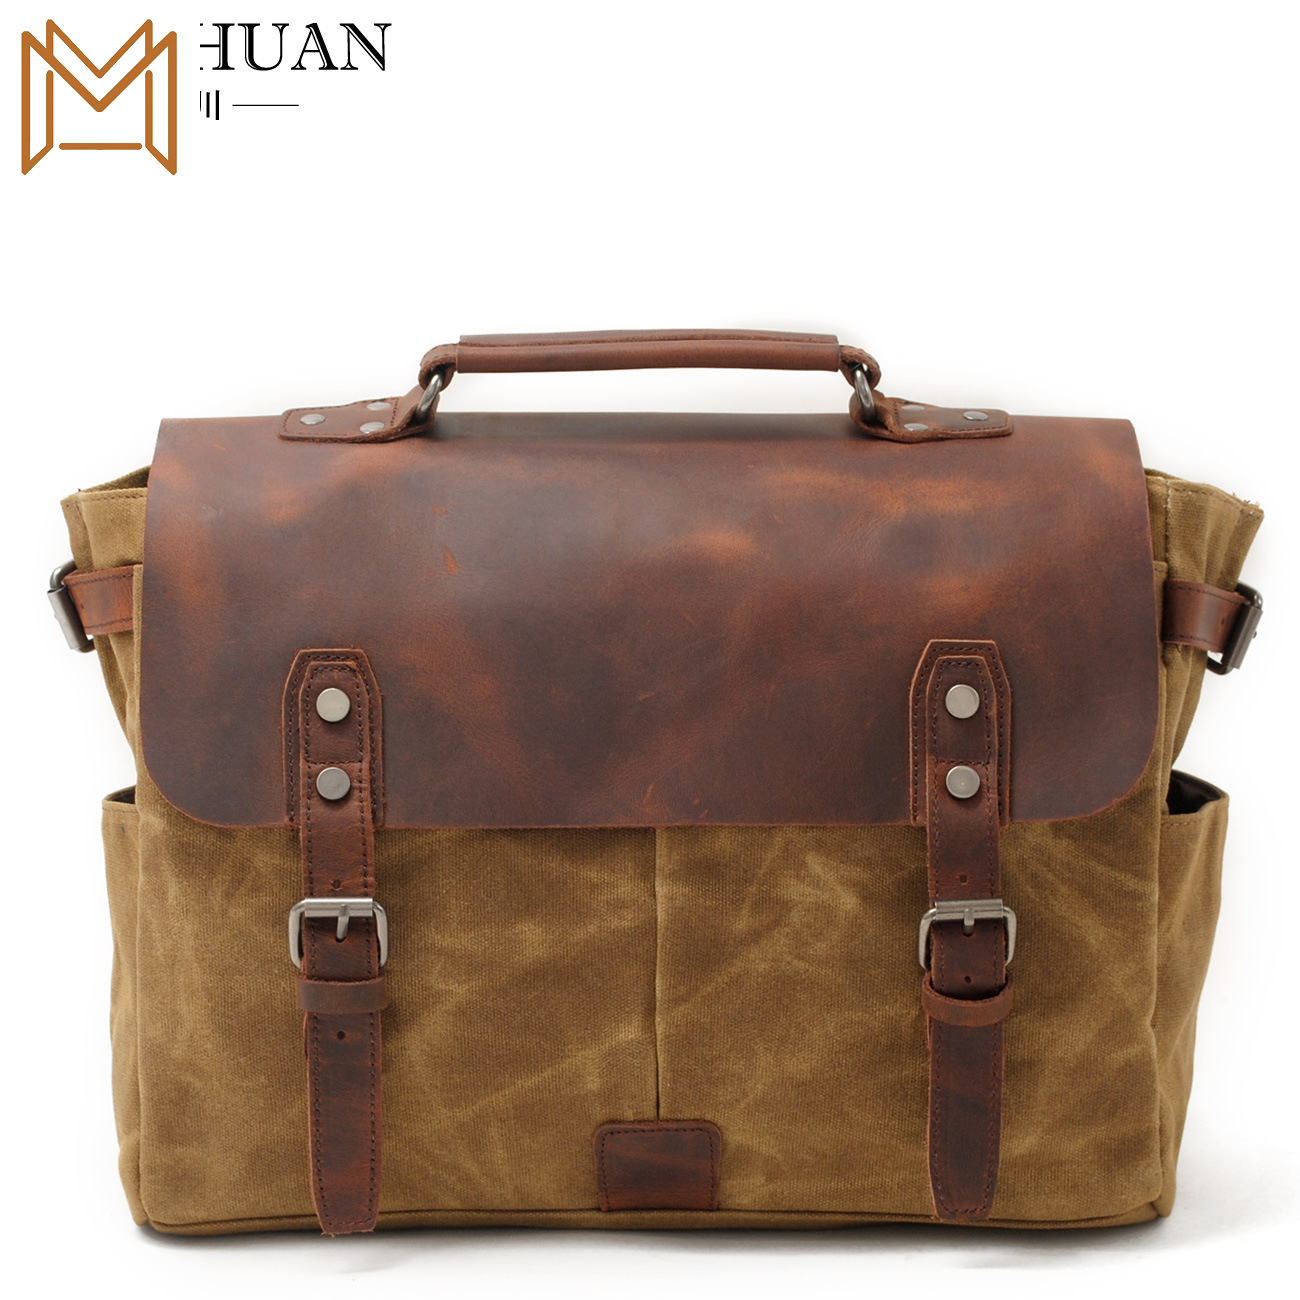 Wax Oil Canvas Crazy Horsehide Document Handbag Male Package Single Shoulder Messenger Handbag